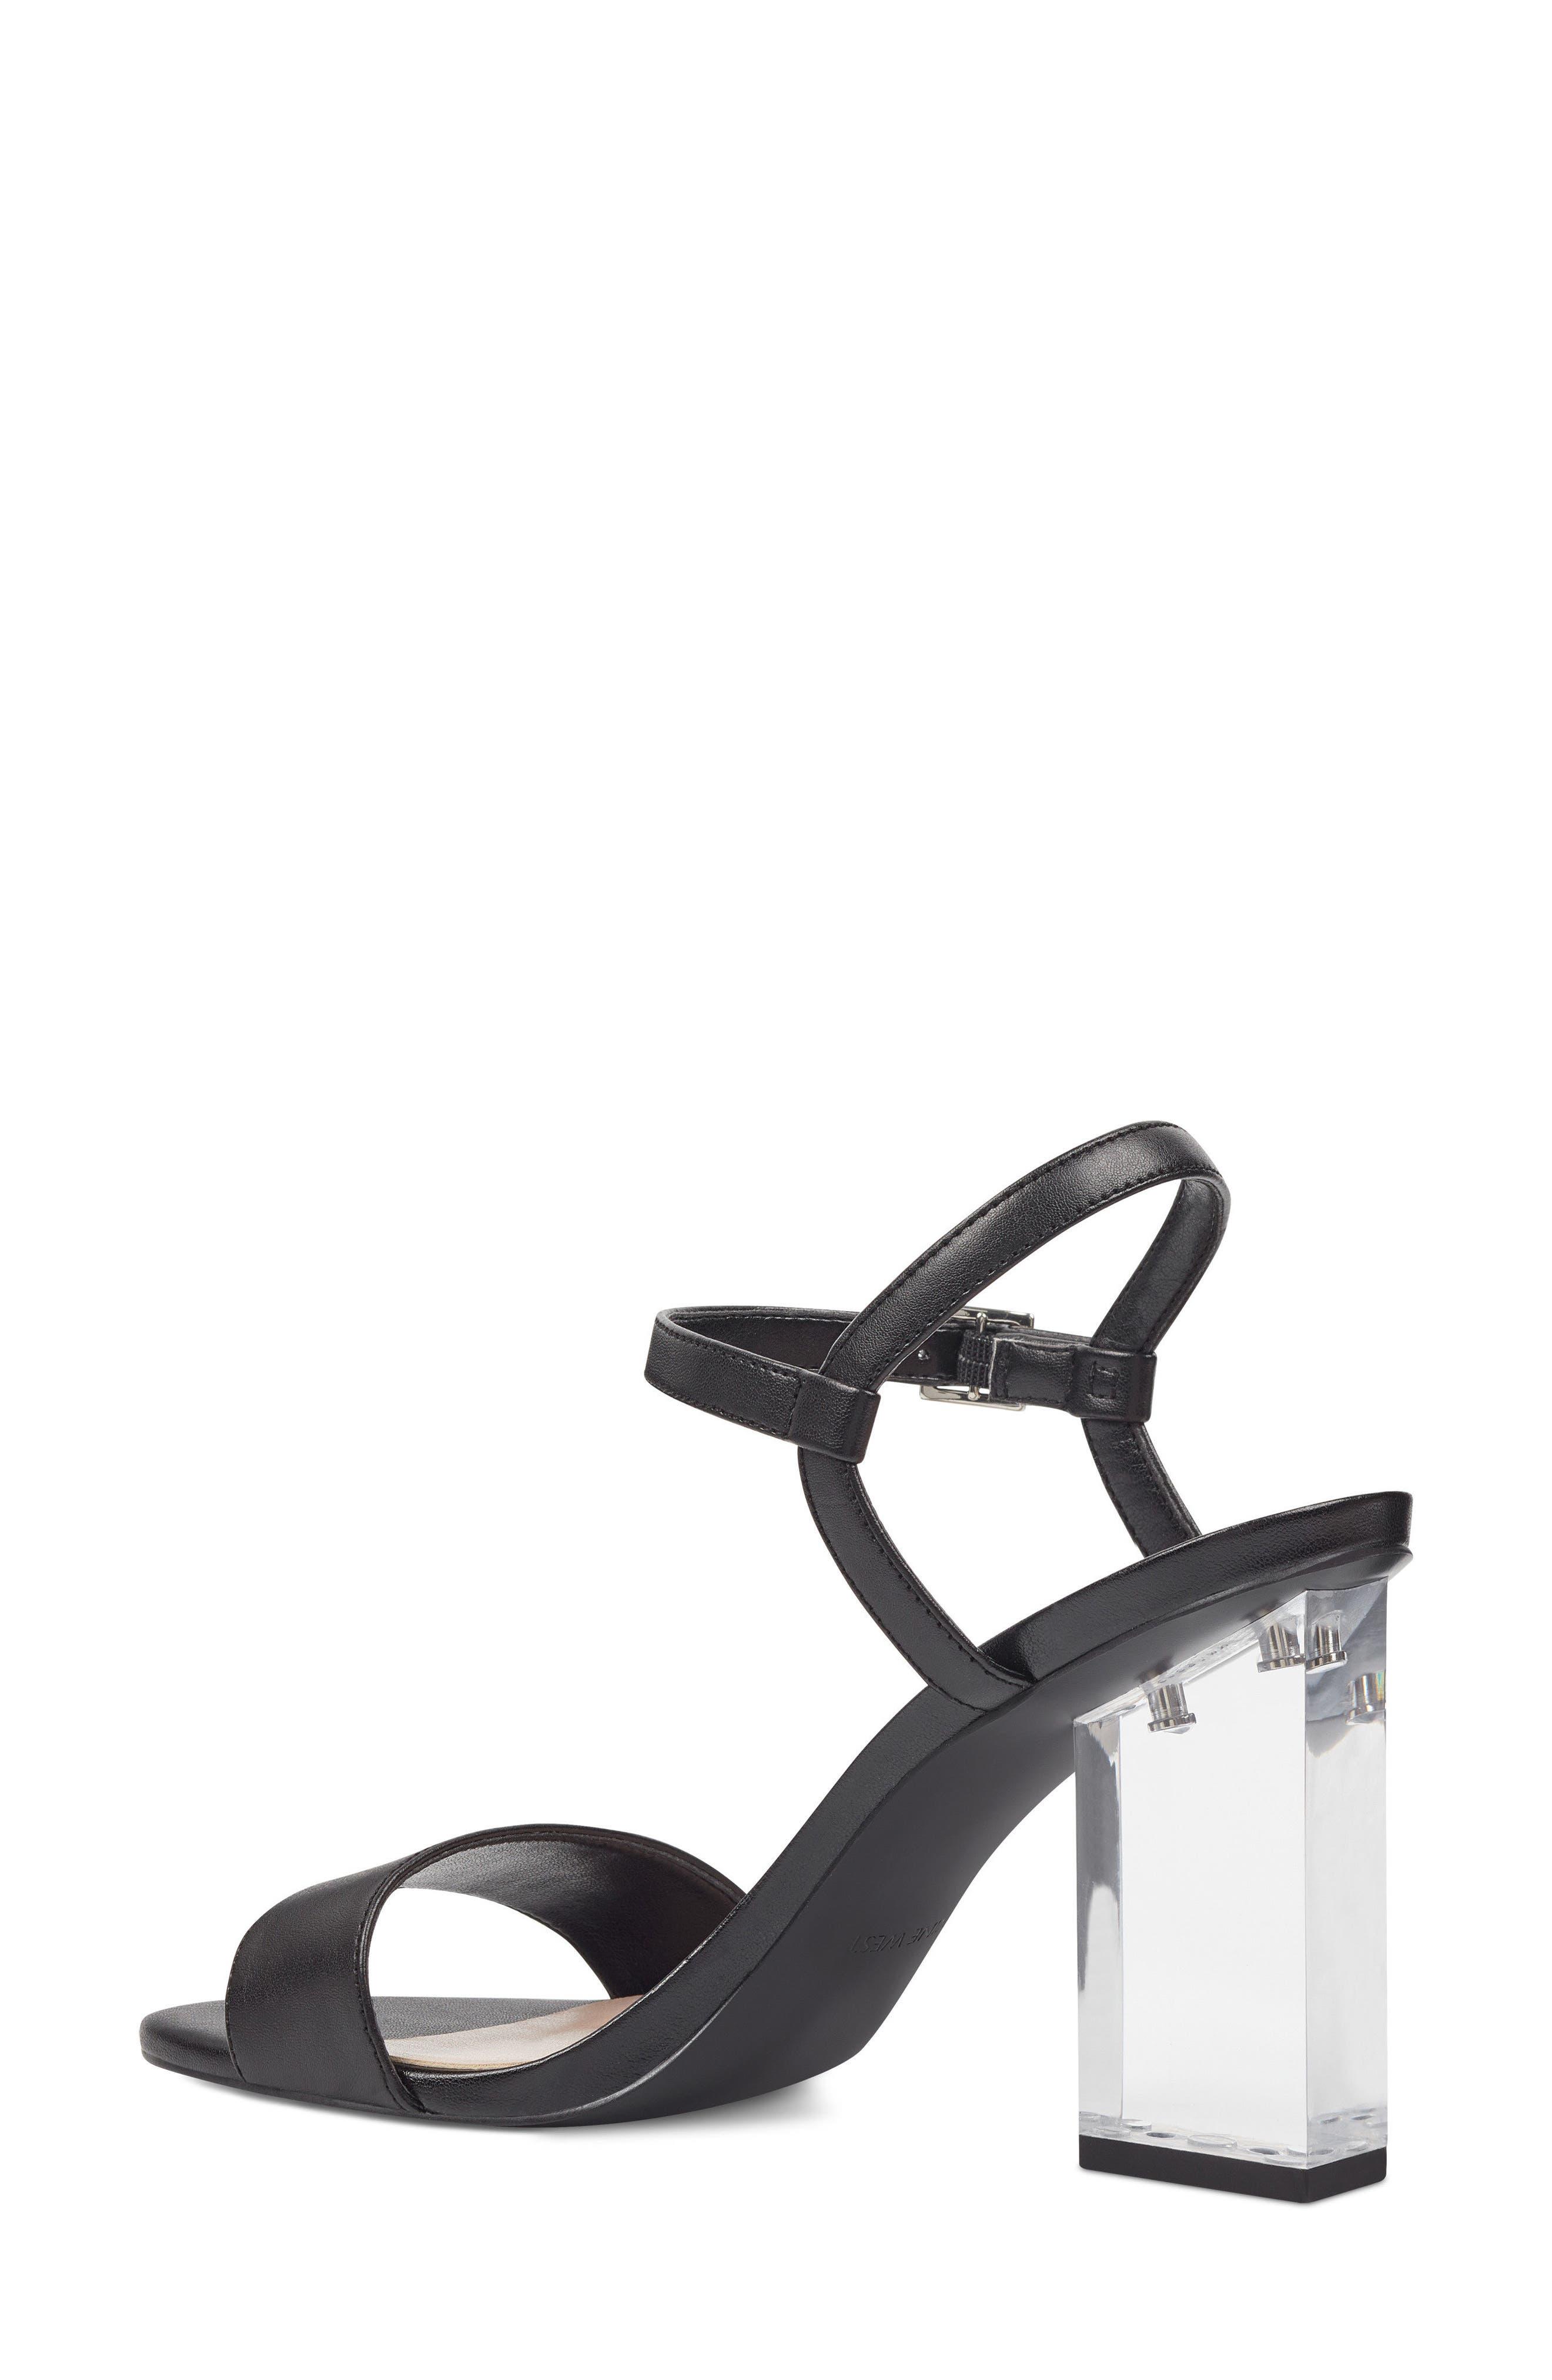 Feisty Ankle Strap Sandal,                             Alternate thumbnail 2, color,                             BLACK SUEDE